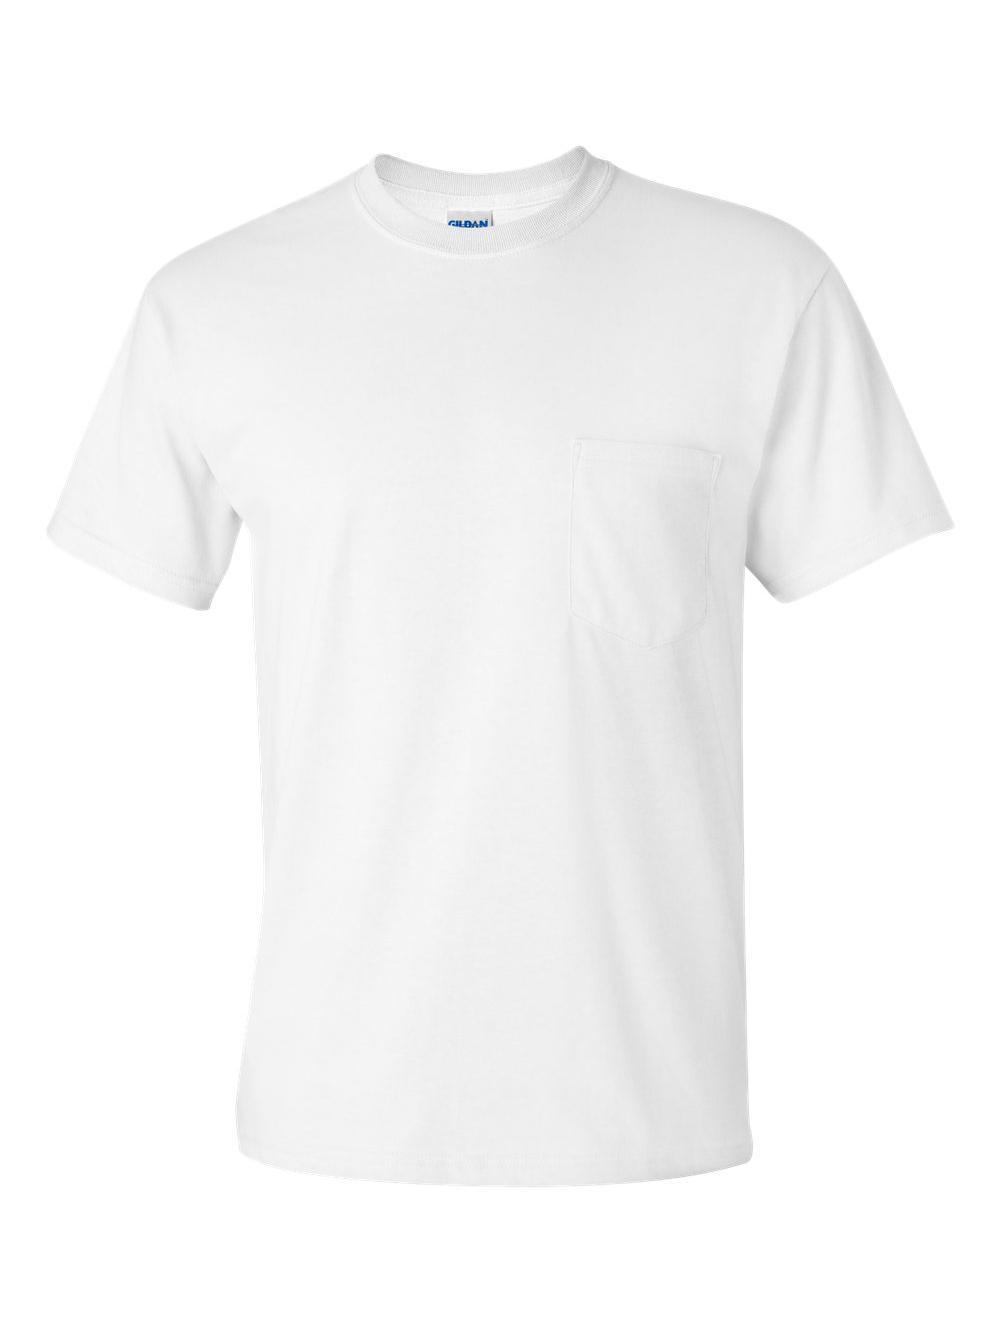 Gildan-Ultra-Cotton-T-Shirt-with-a-Pocket-2300 thumbnail 45